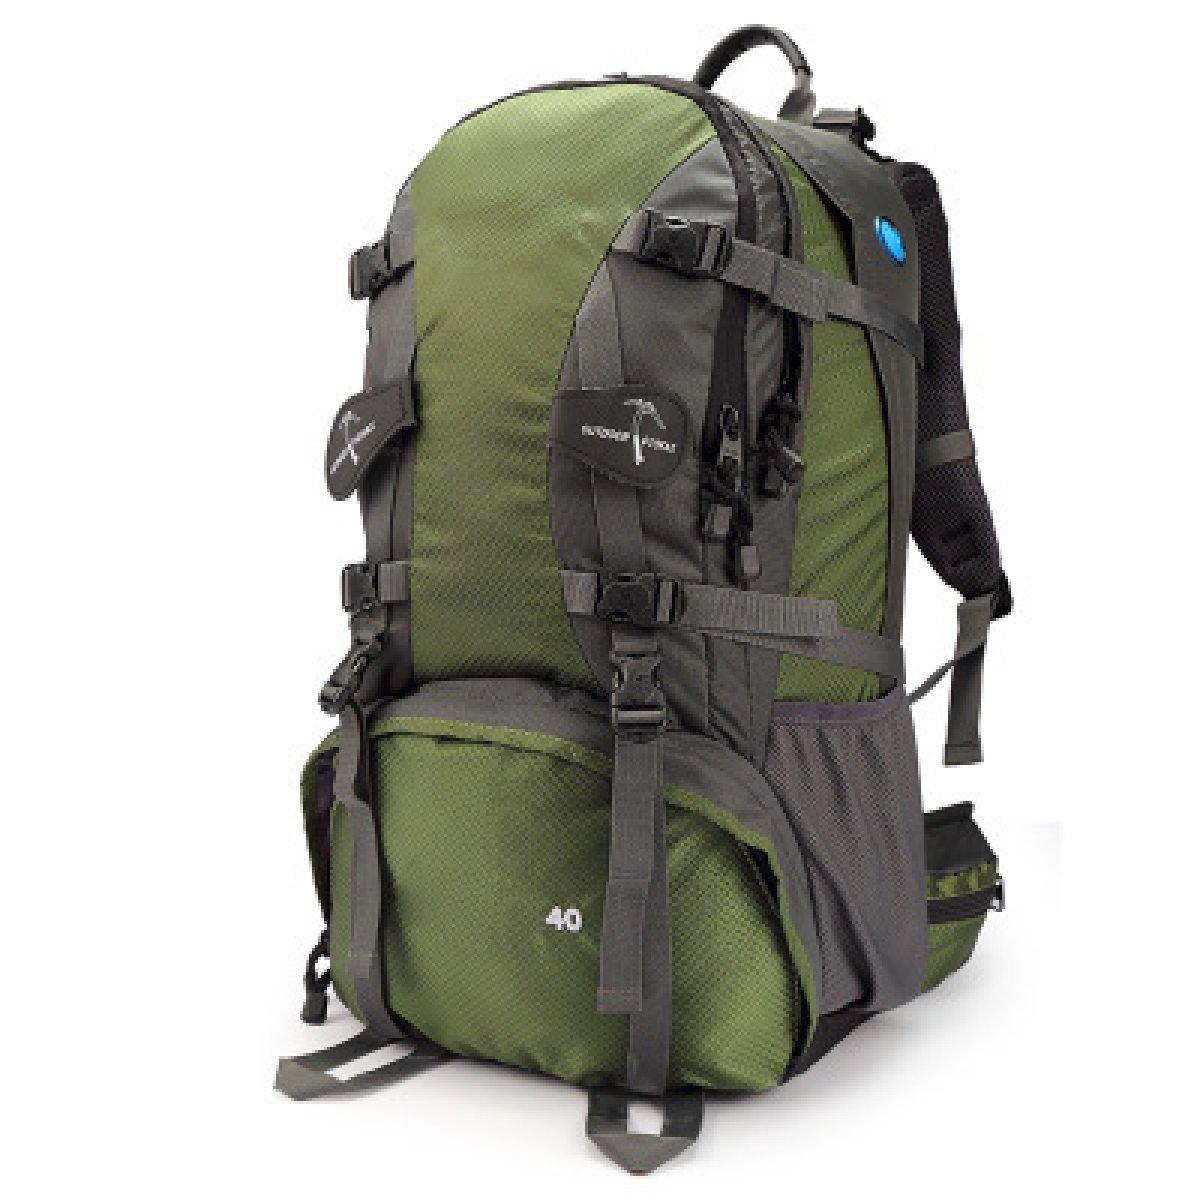 Armyvert  40L Sac D'alpinisme Camping Ski Nautique voyage voyage de plein air Riding sac à dos,rouge